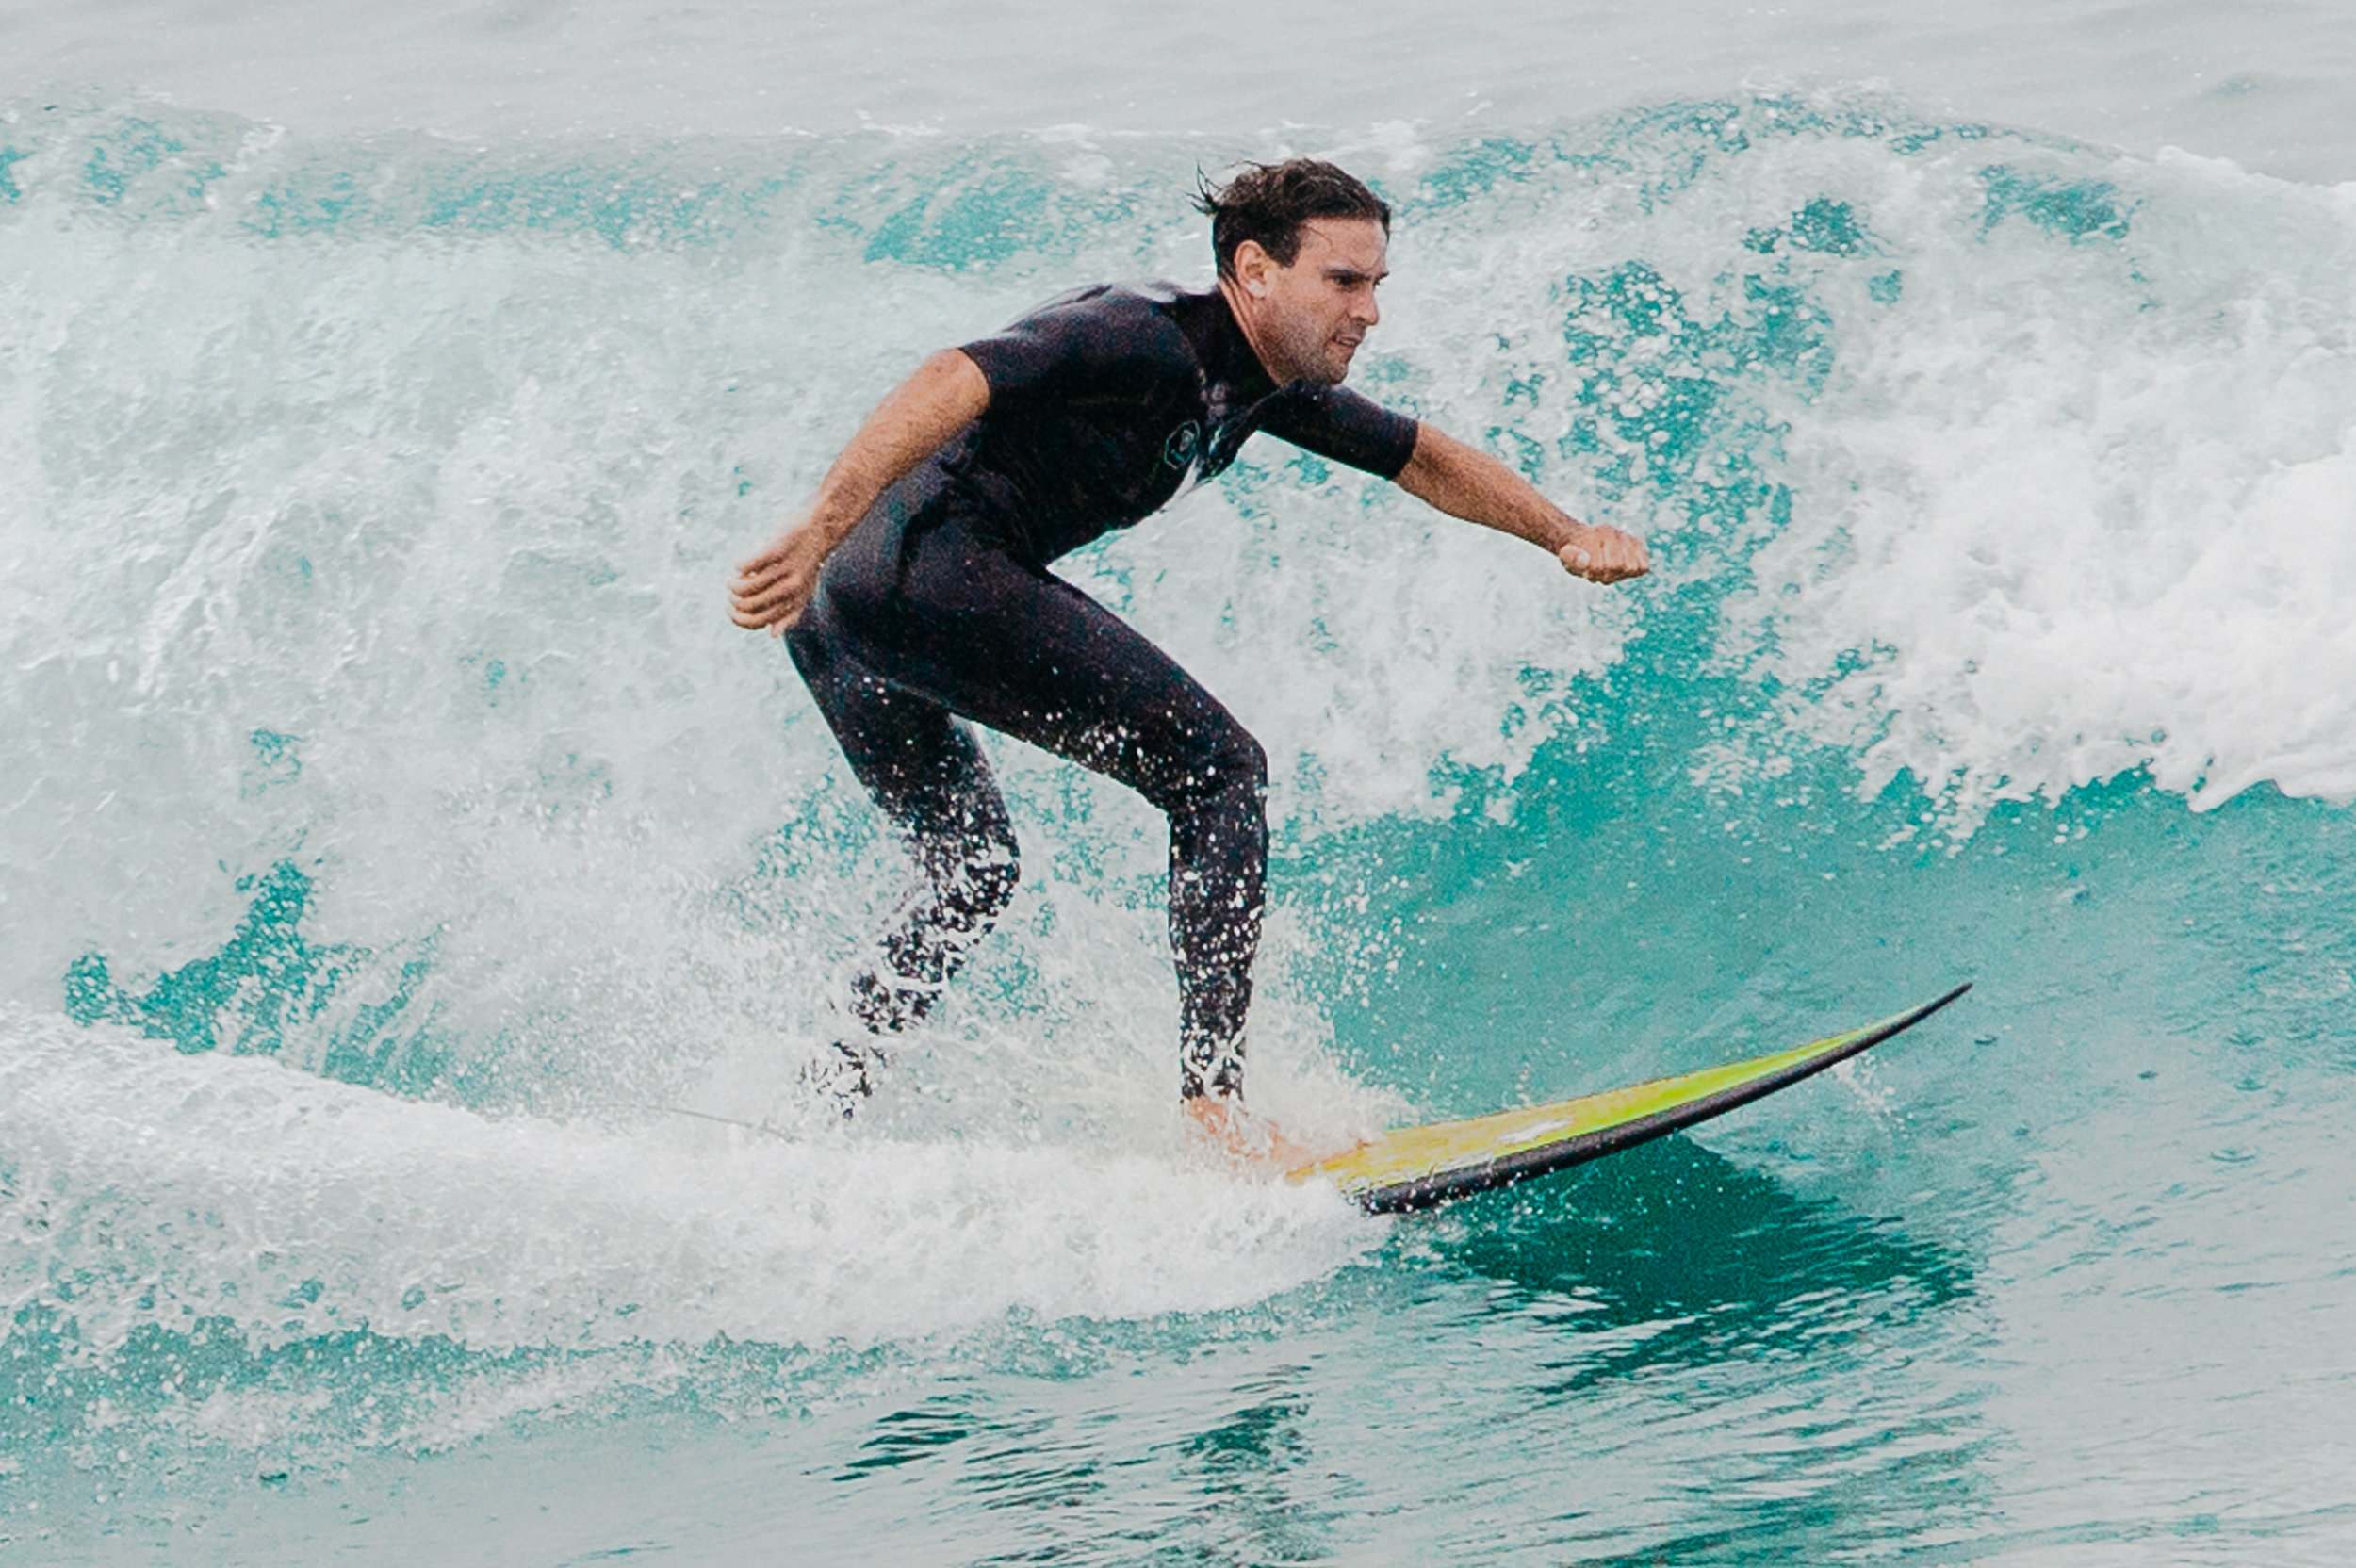 surf_july31-2.JPG